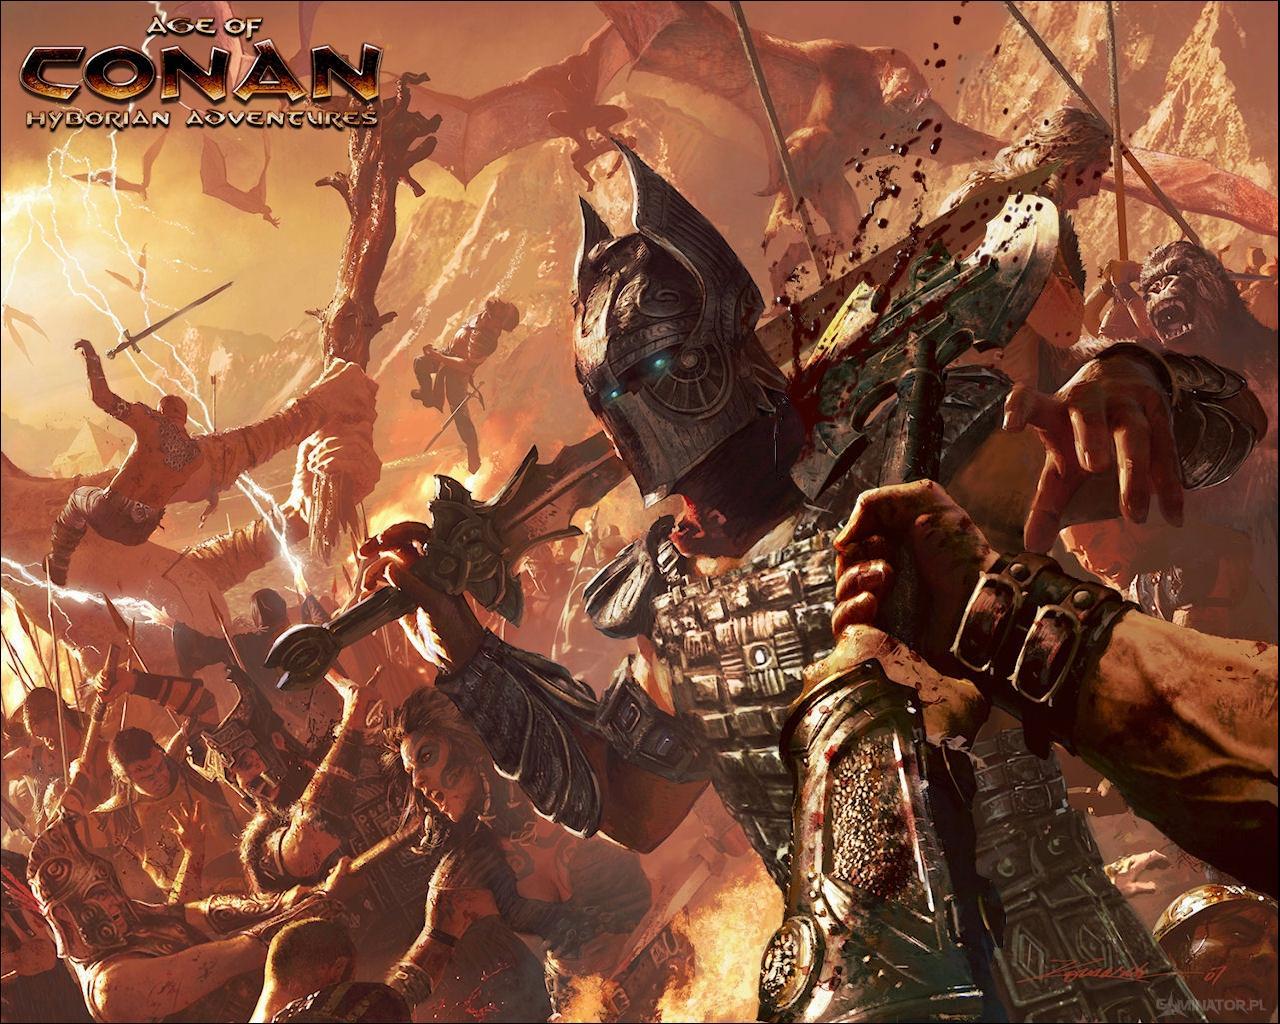 wallpapers age of conan: hyborian adventures games